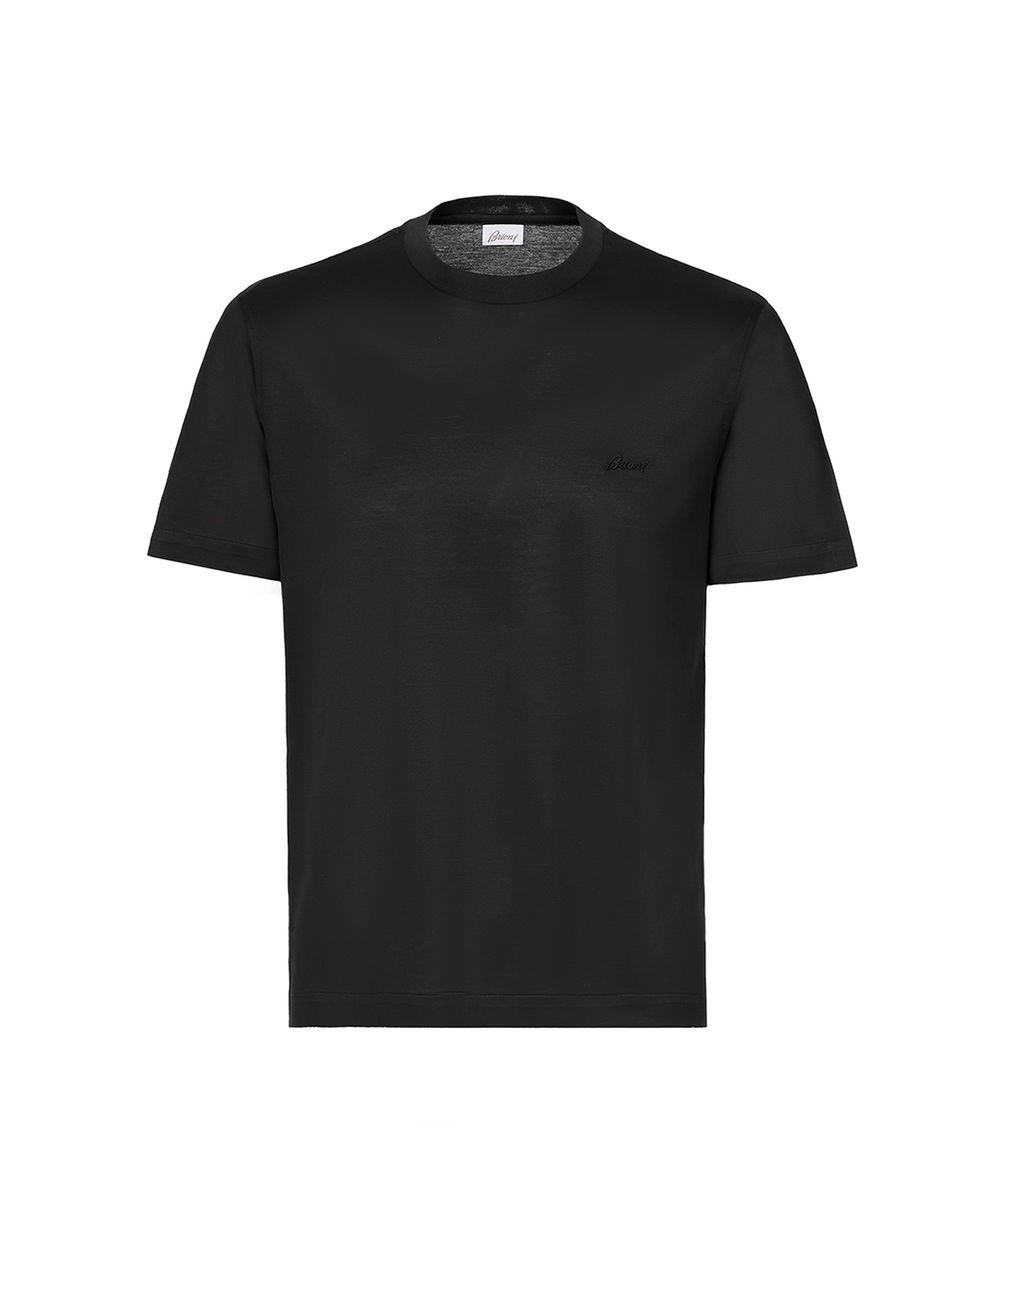 BRIONI Black Logoed T-Shirt T-Shirts & Polos Man f